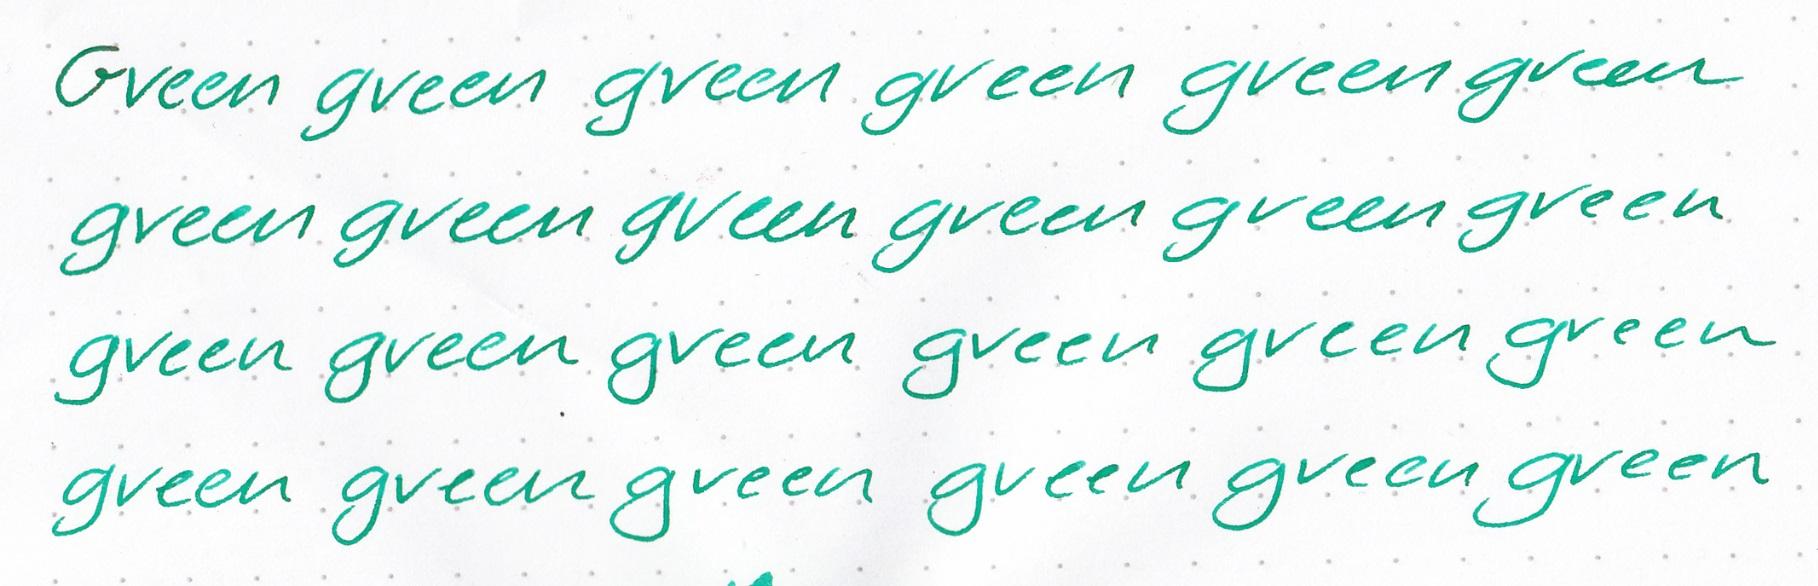 fpn_1455225080__green_jinhao_rhodia_1.jp